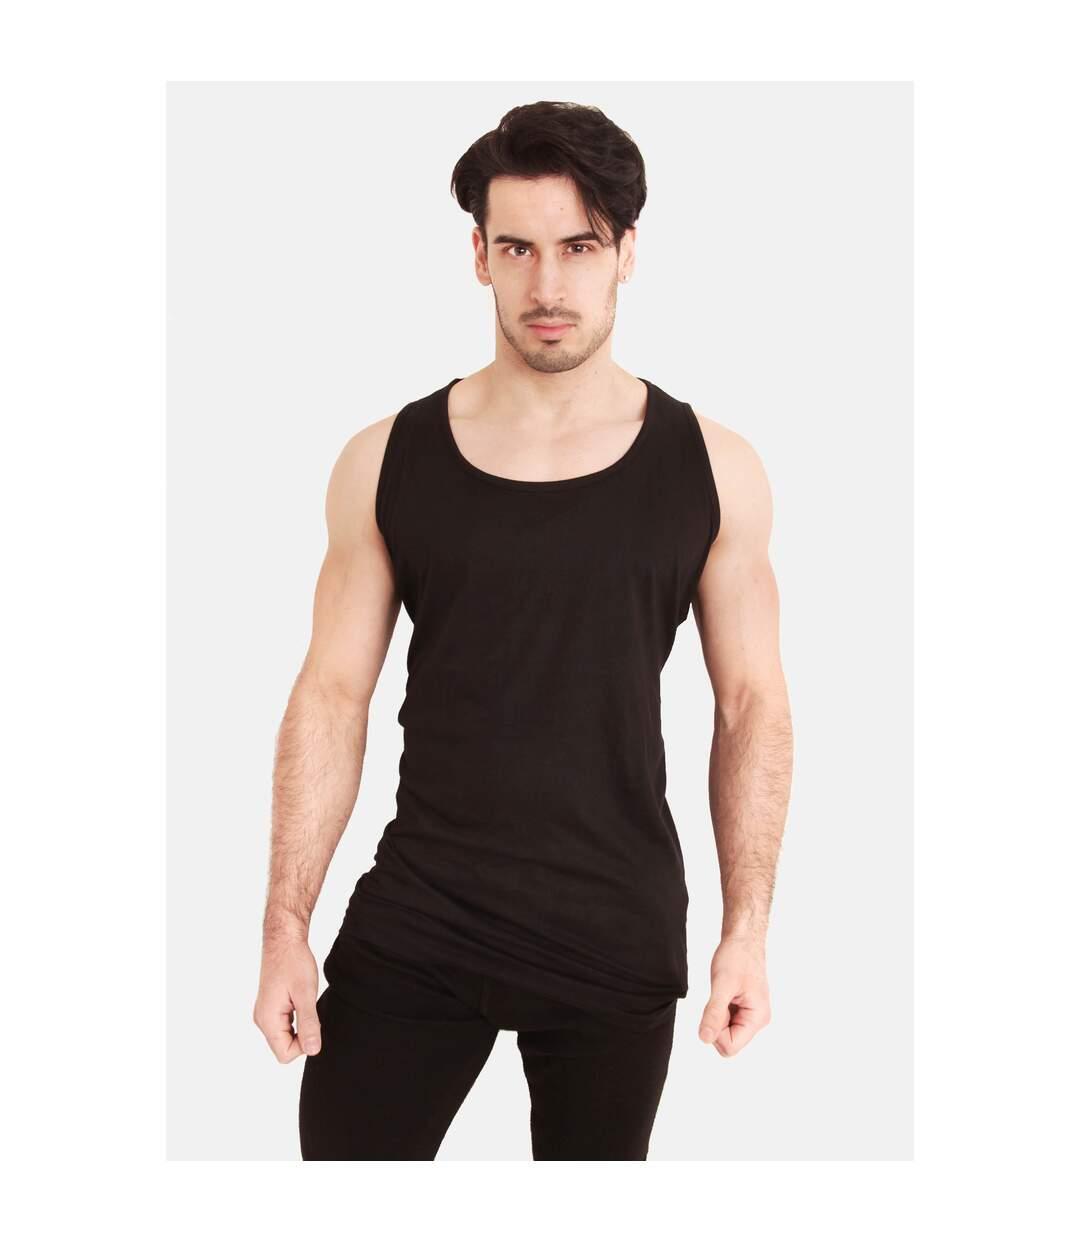 Duke Mens Fabio-1 Kingsize Muscle Vest (Black) - UTDC171